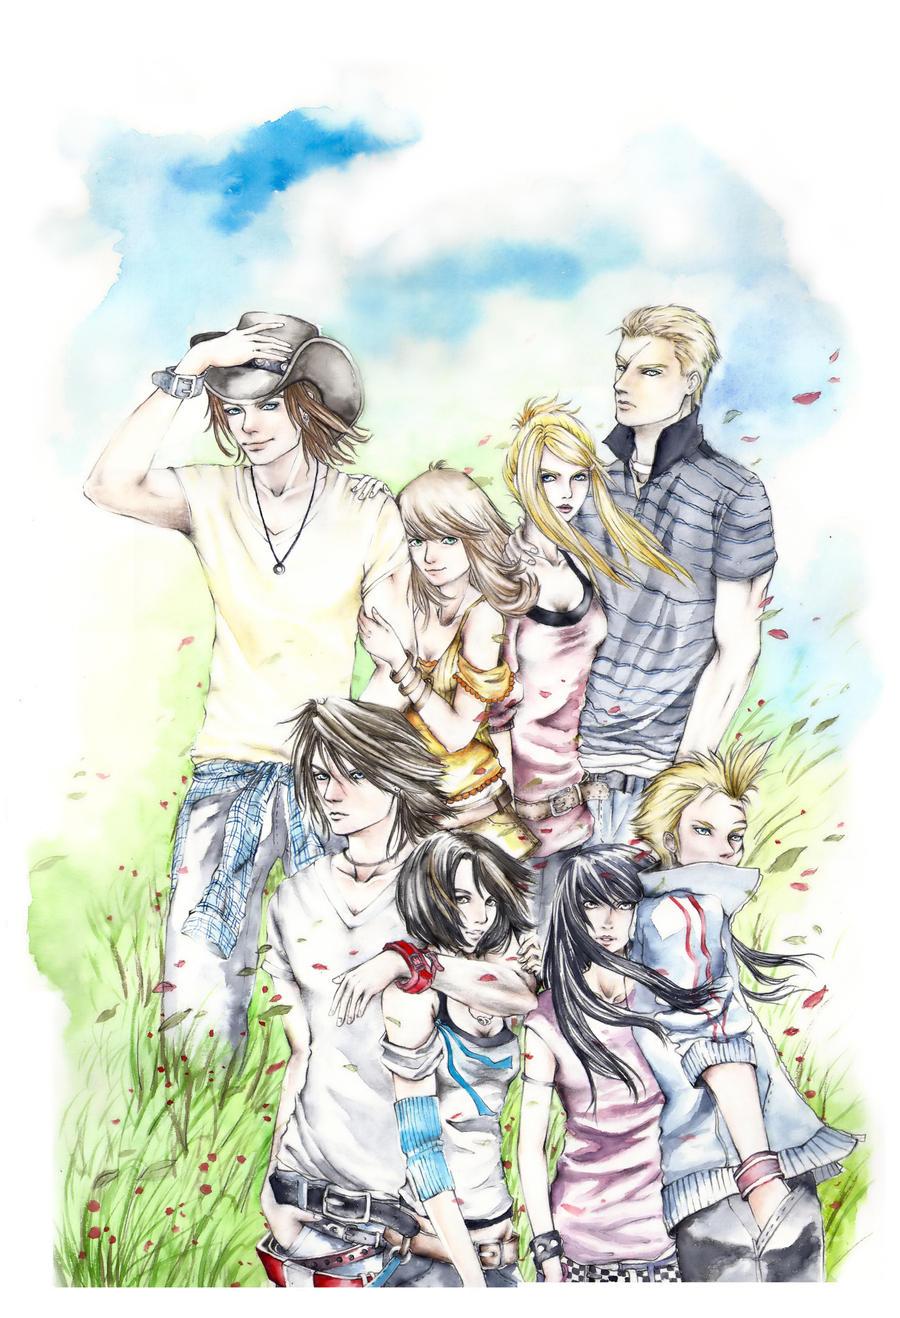 http://img03.deviantart.net/cf30/i/2011/202/e/8/final_fantasy_viii__grupo__by_riny_san-d415wmt.jpg